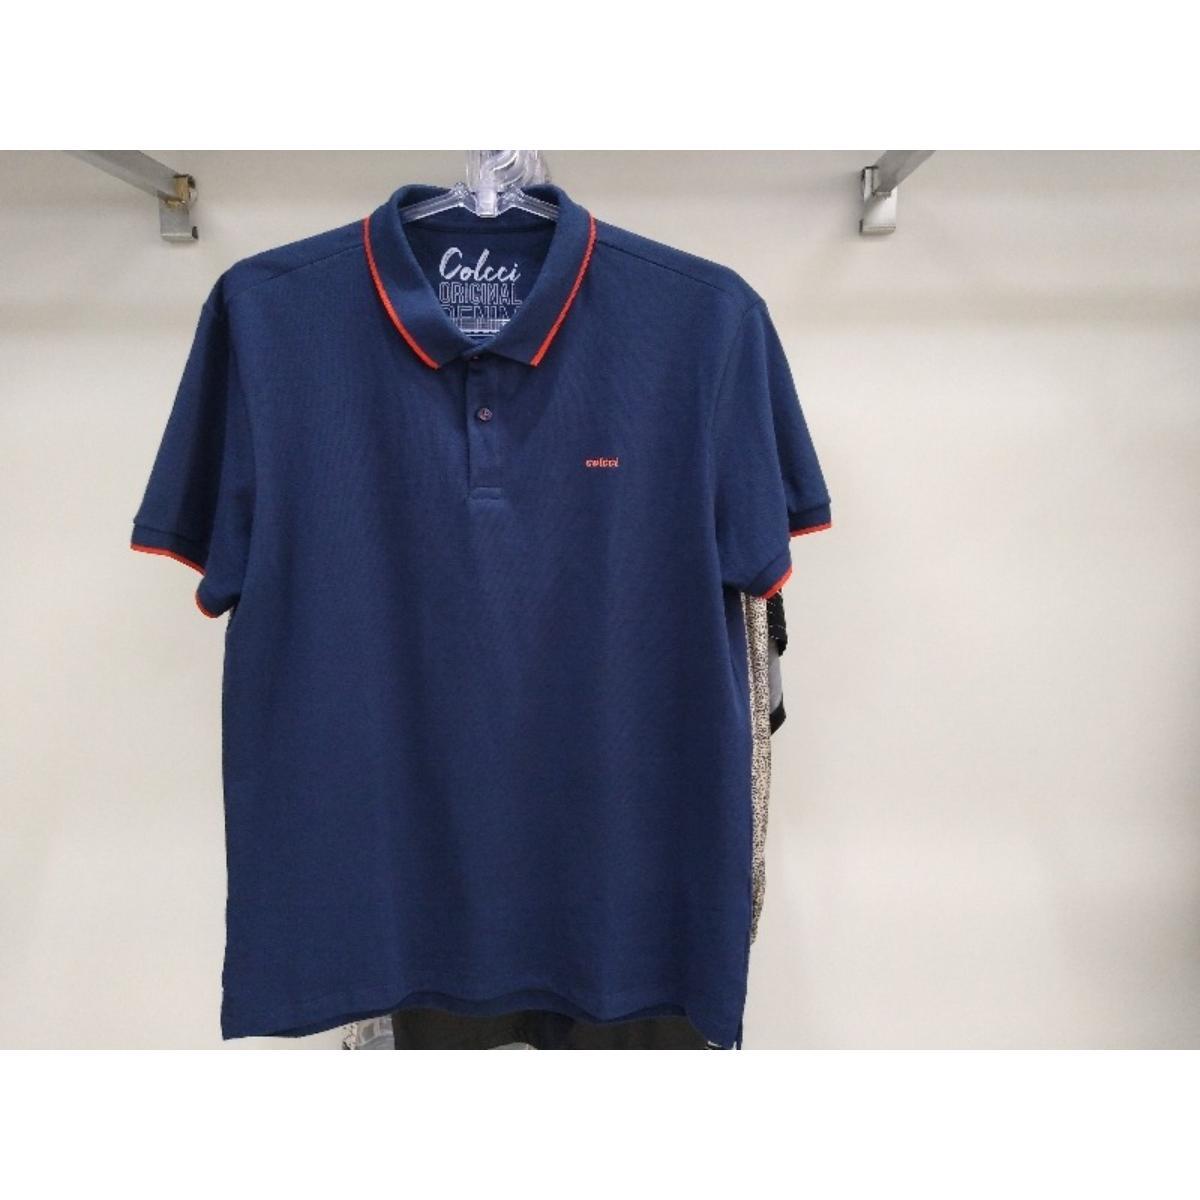 Camiseta Masculina Colcci 250102555 33664 Marinho